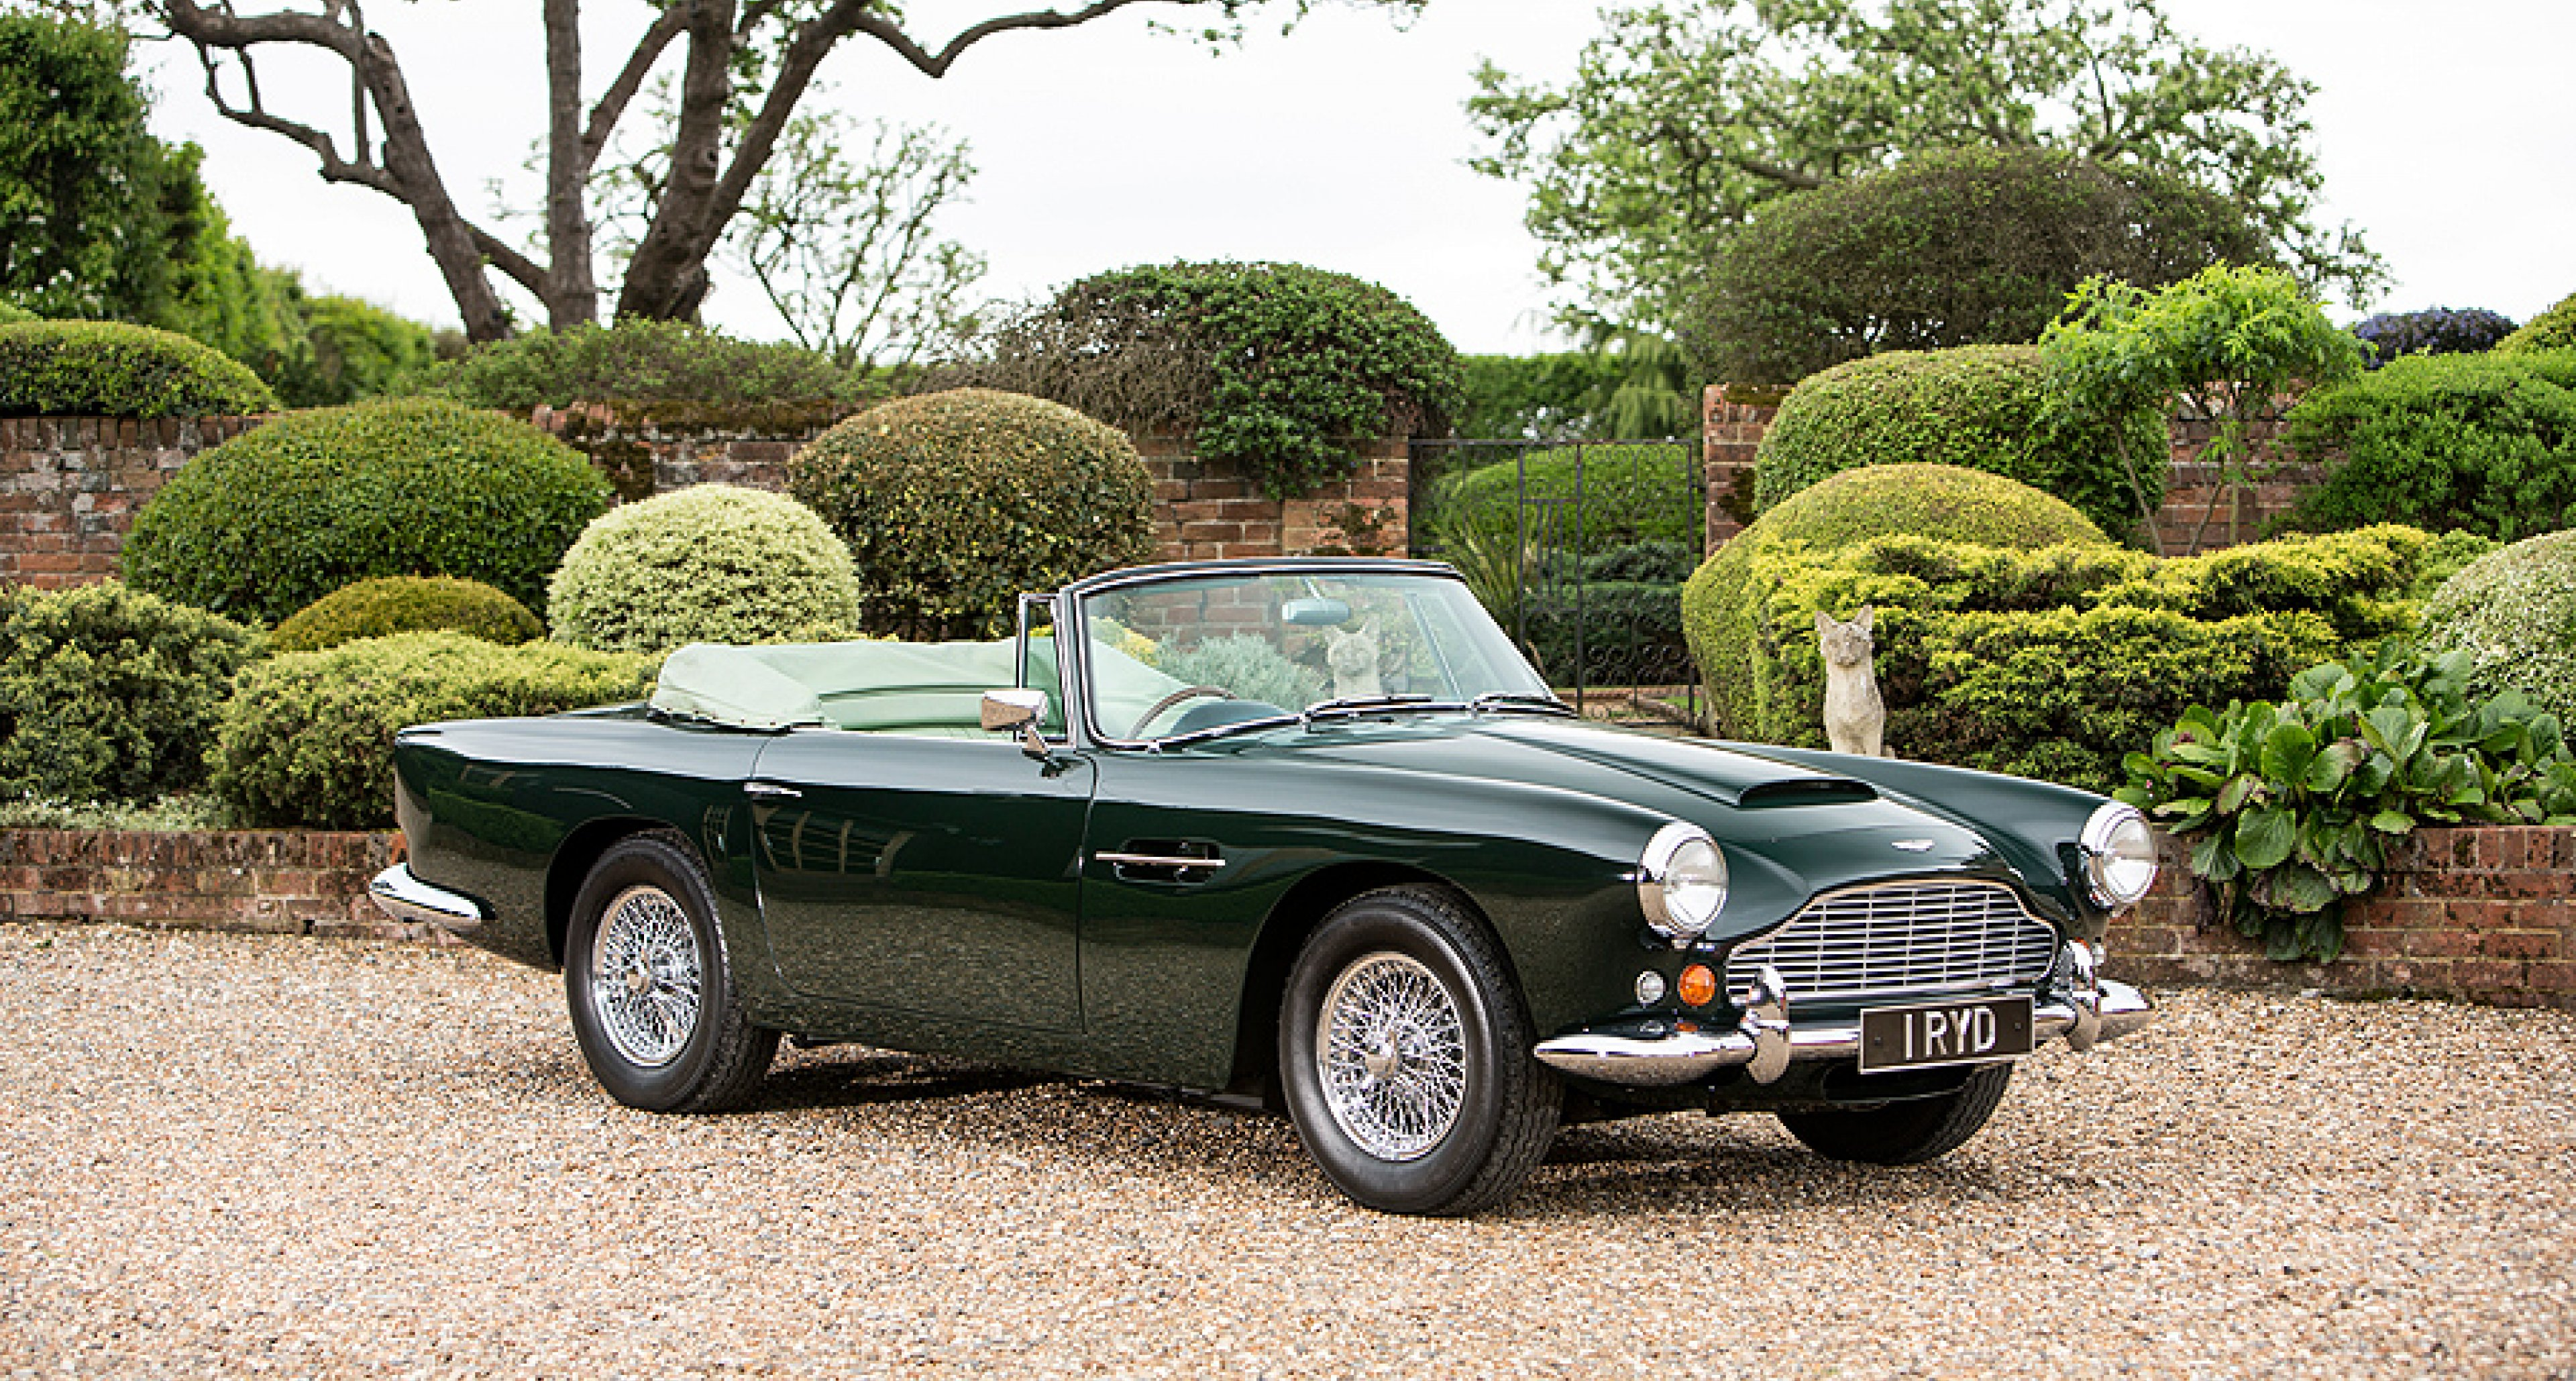 Aston Martin Db4 Convertible Never In The Shade Clic Driver Magazine